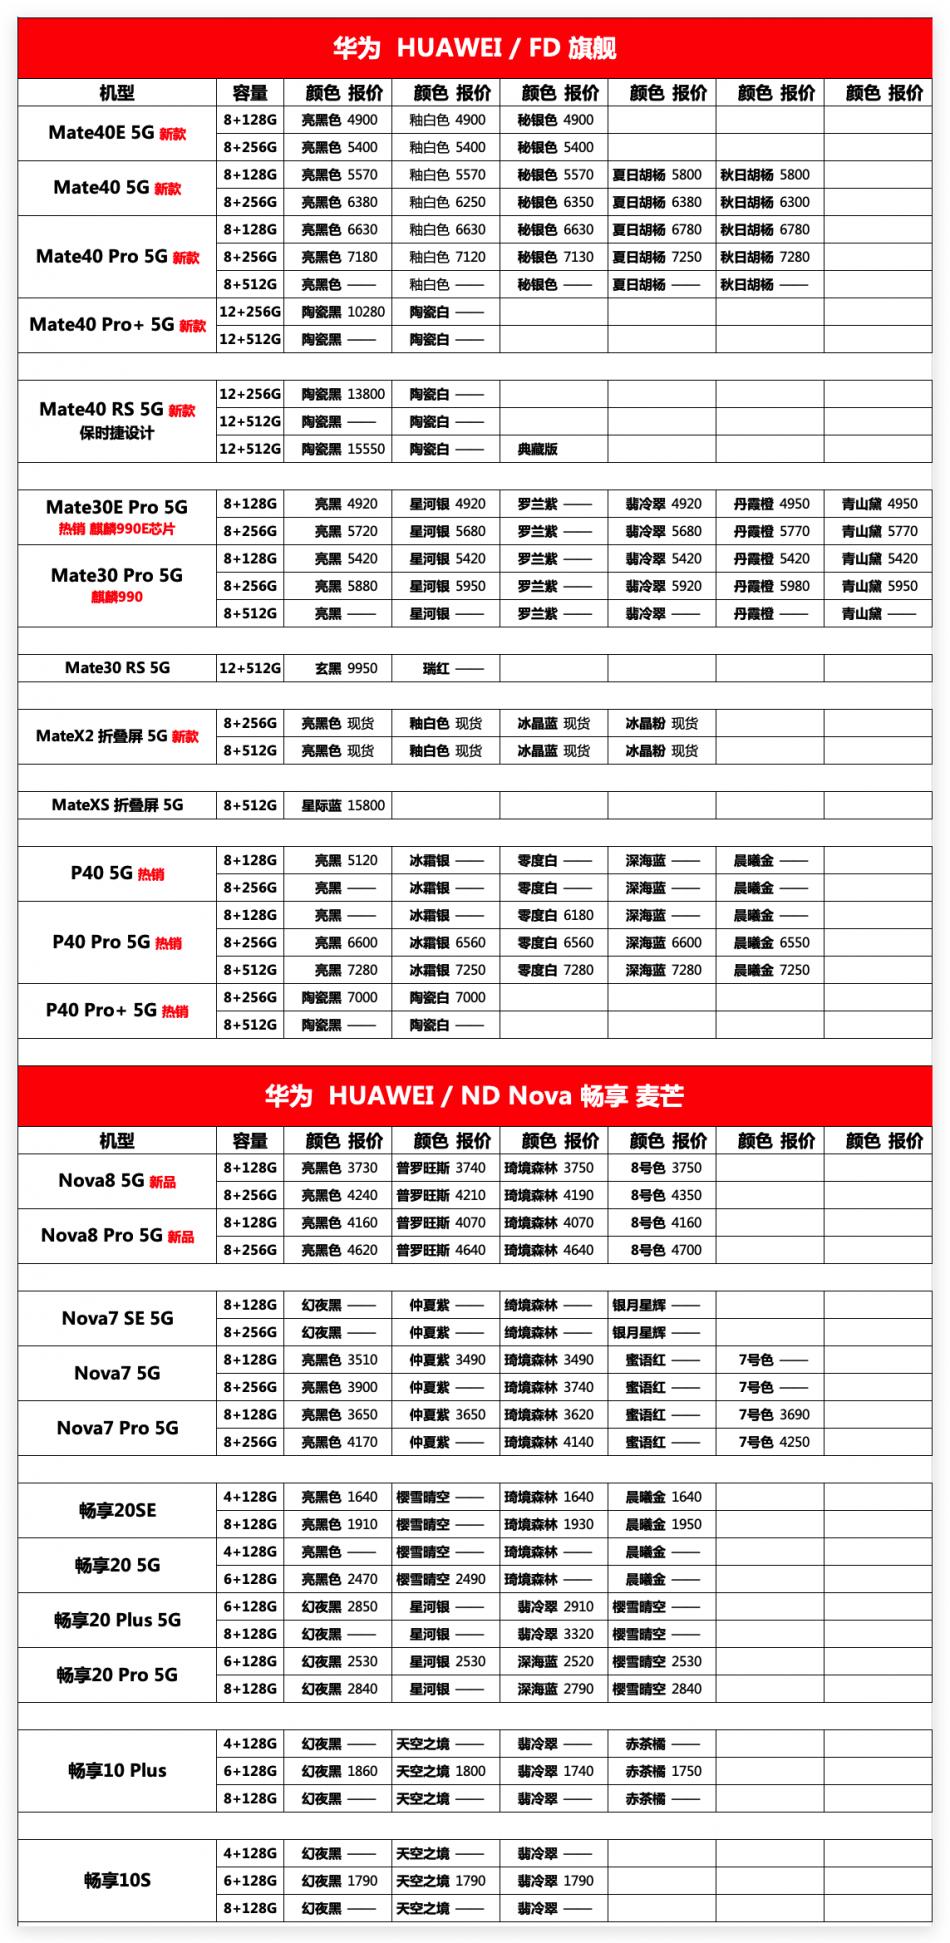 Xnip2021-04-16_13-26-47.png